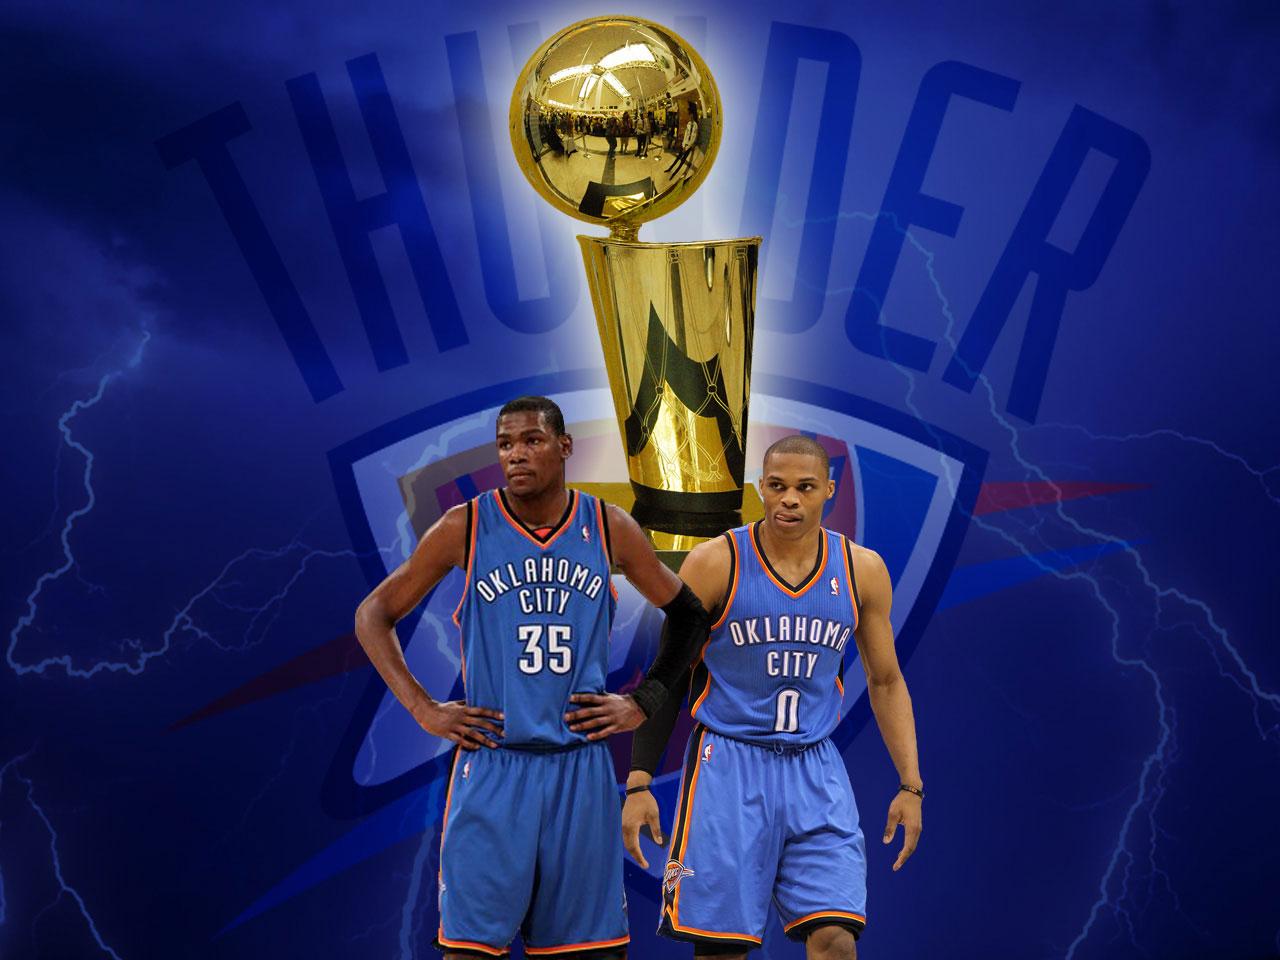 Oklahoma City Thunder NBA Trophy Wallpaper ~ Big Fan of ...